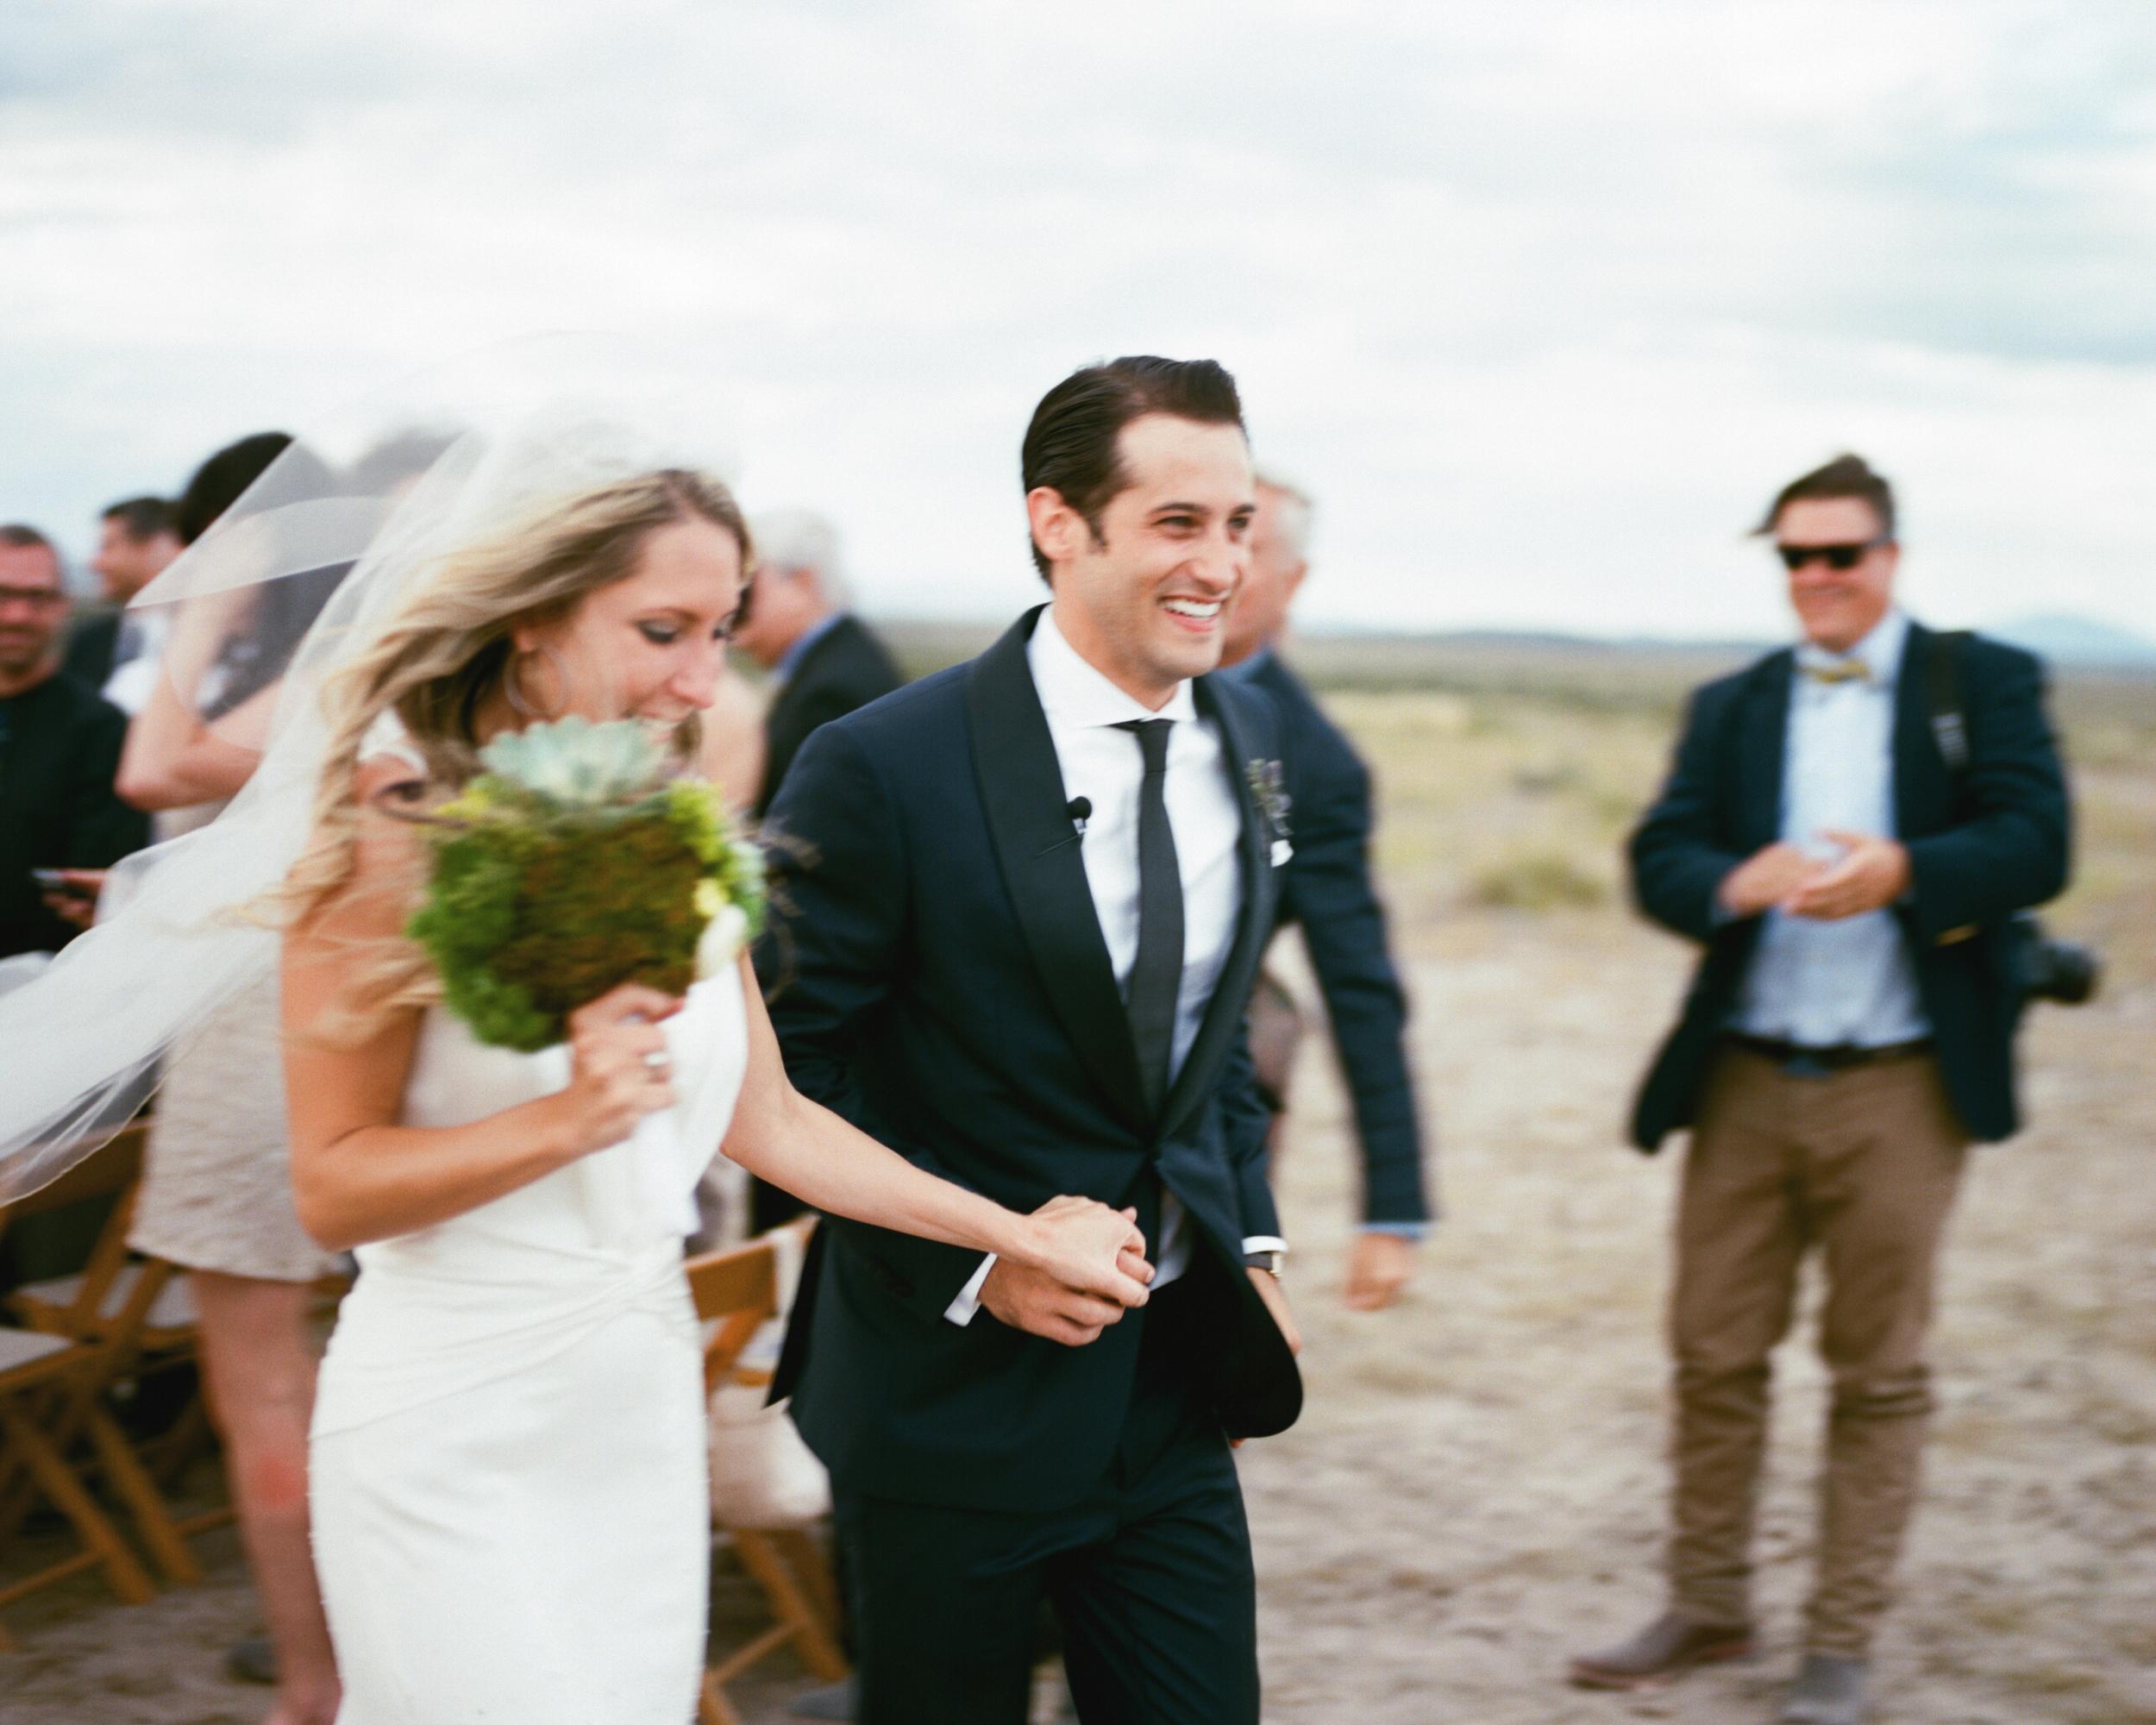 Marfa Wedding - Jessica Garmon